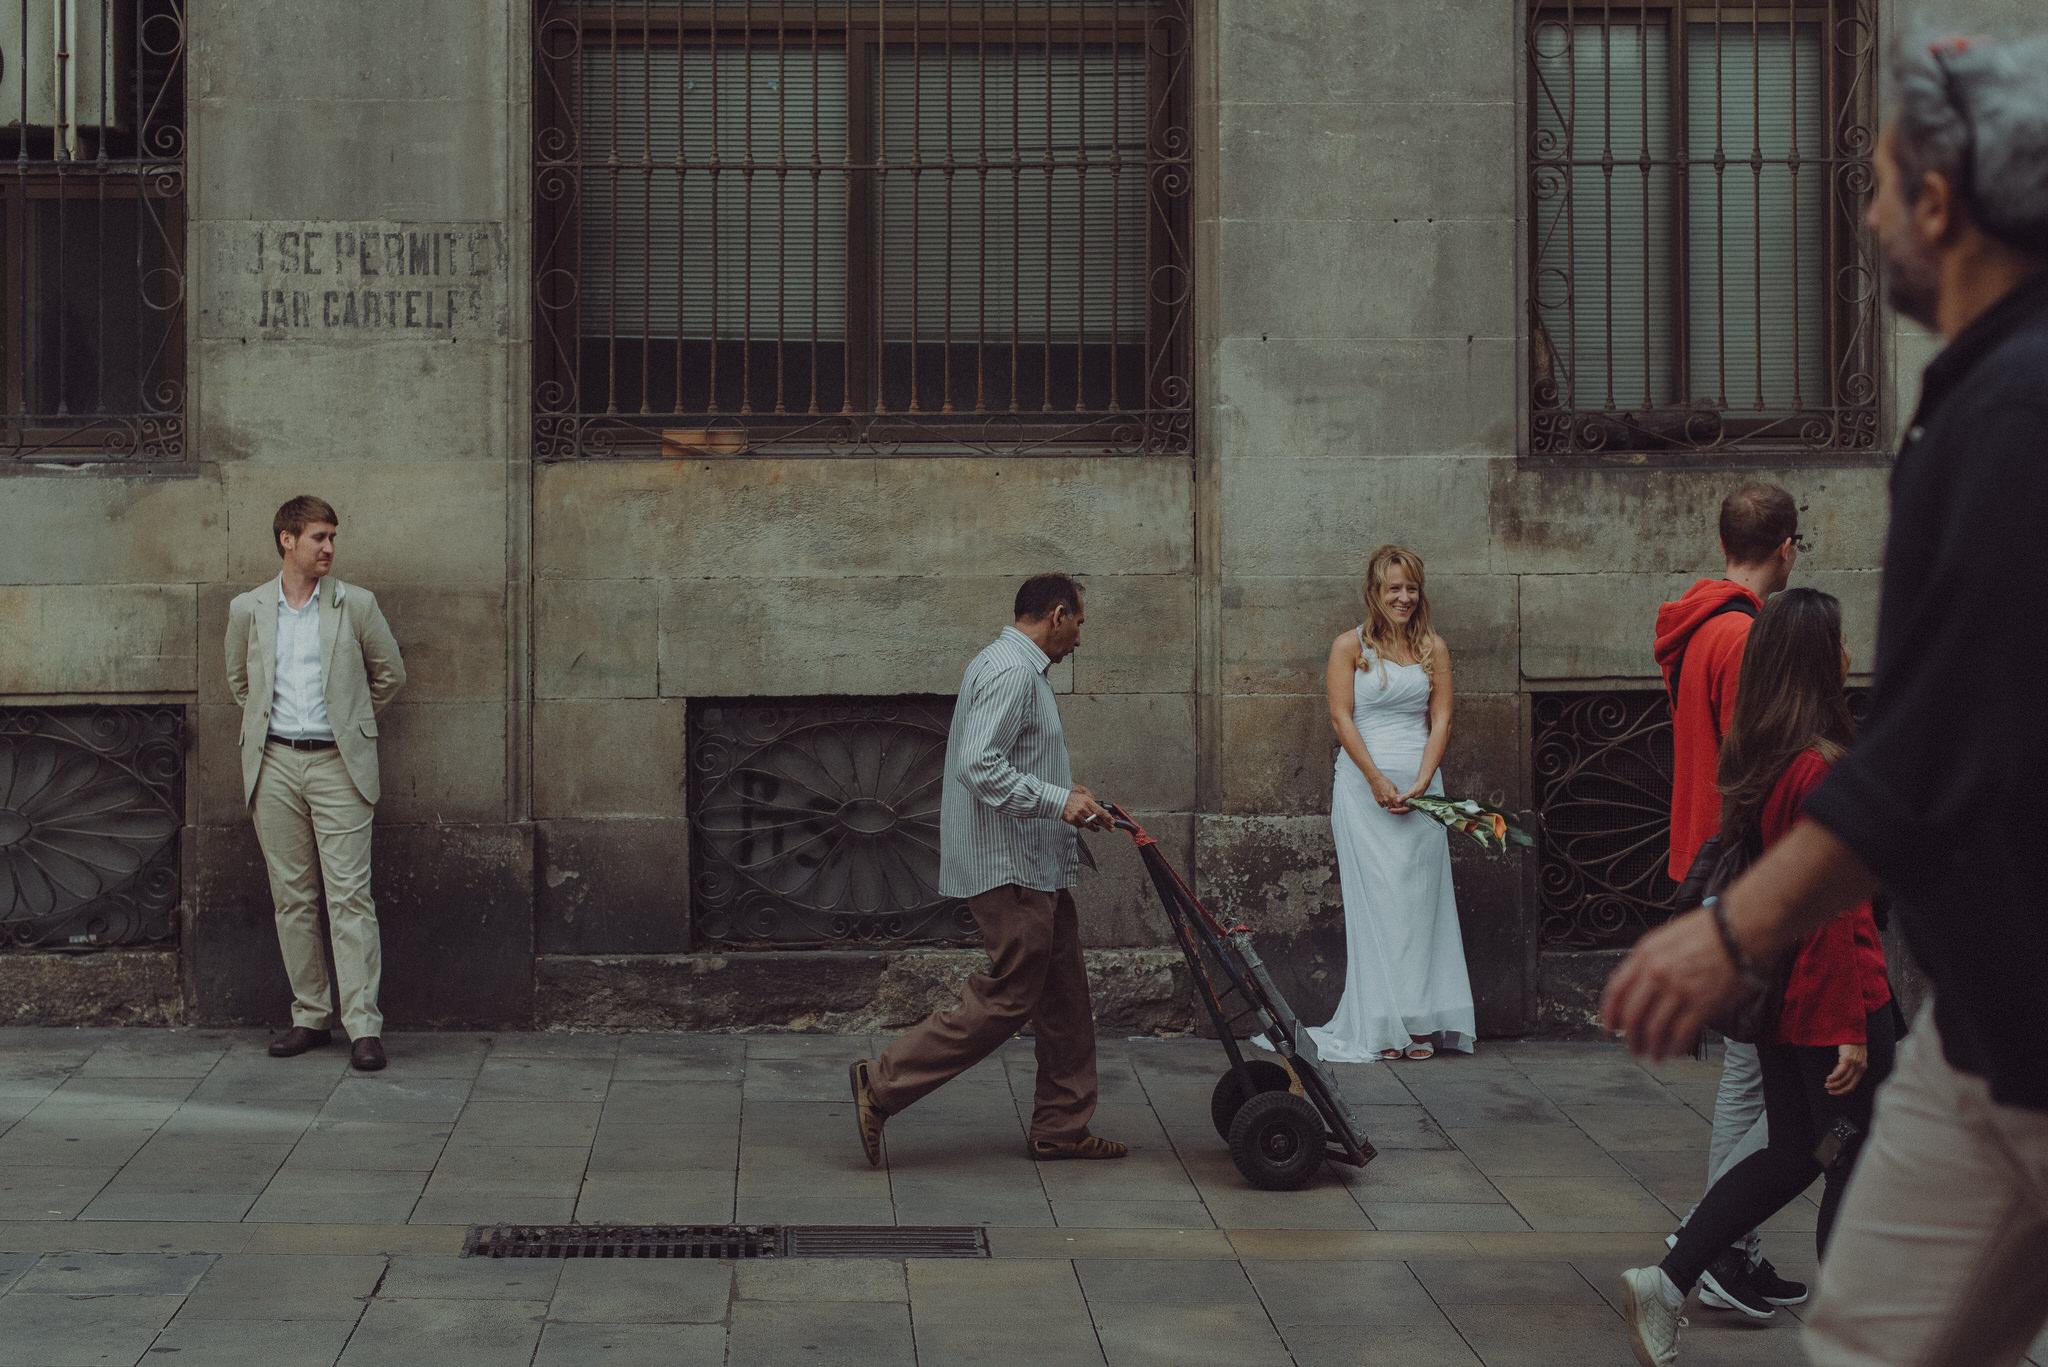 Carles & Mirka's beach wedding in Ocata, Barcelona - 9th October 2015.